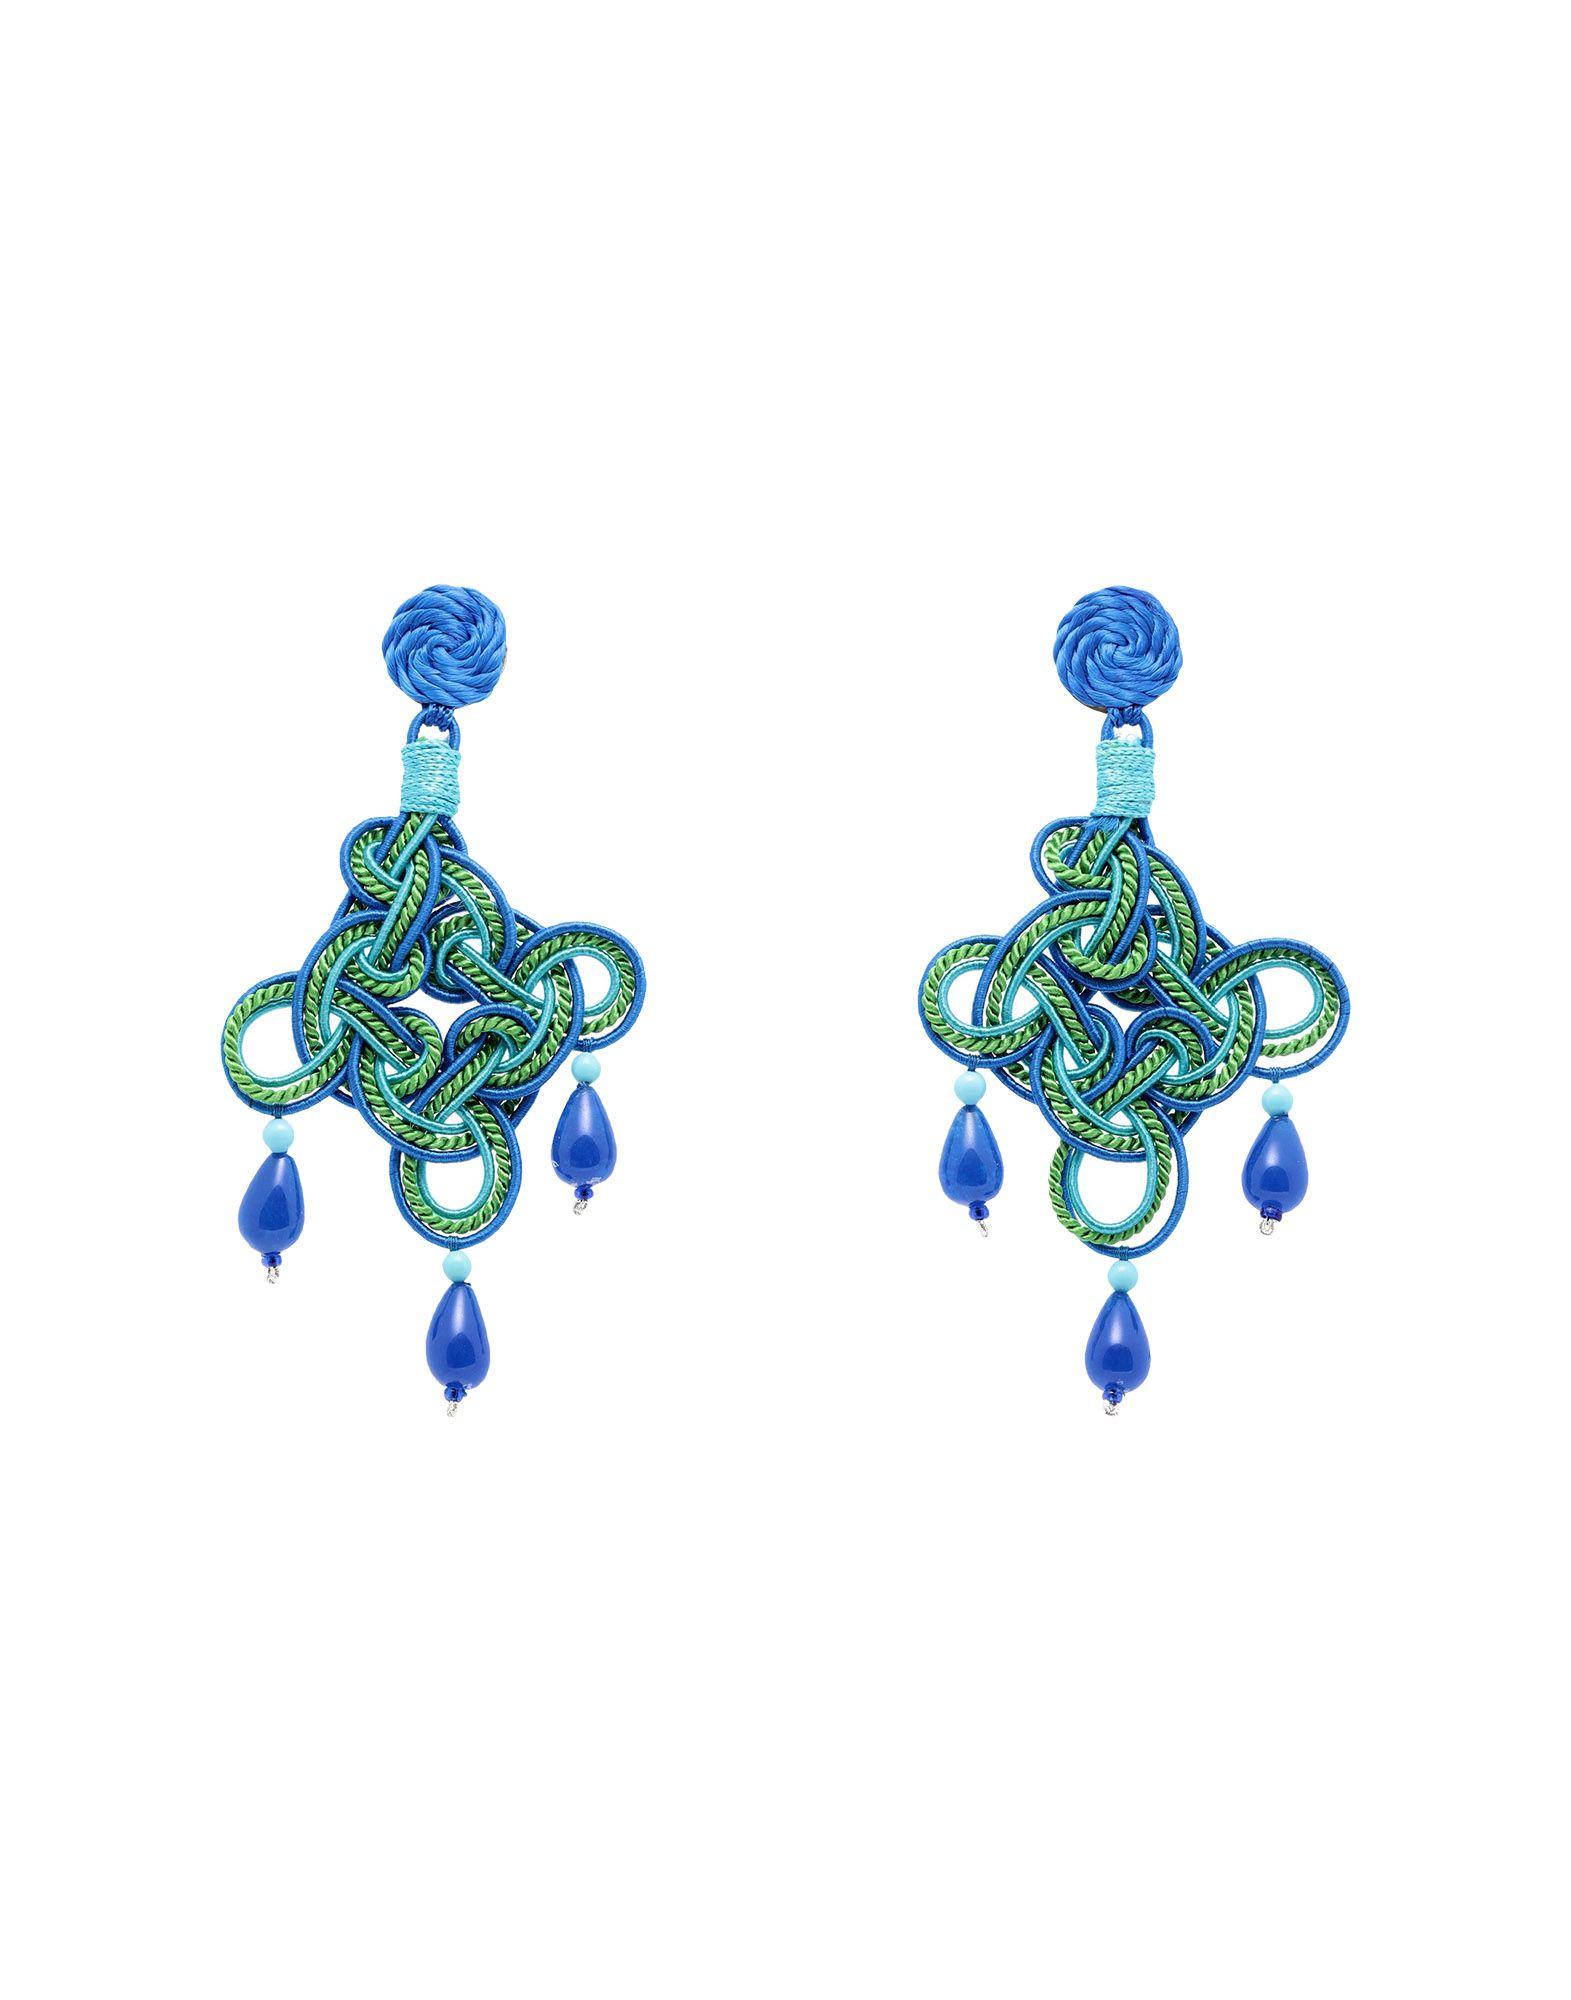 ANNA E ALEX Earrings in Green